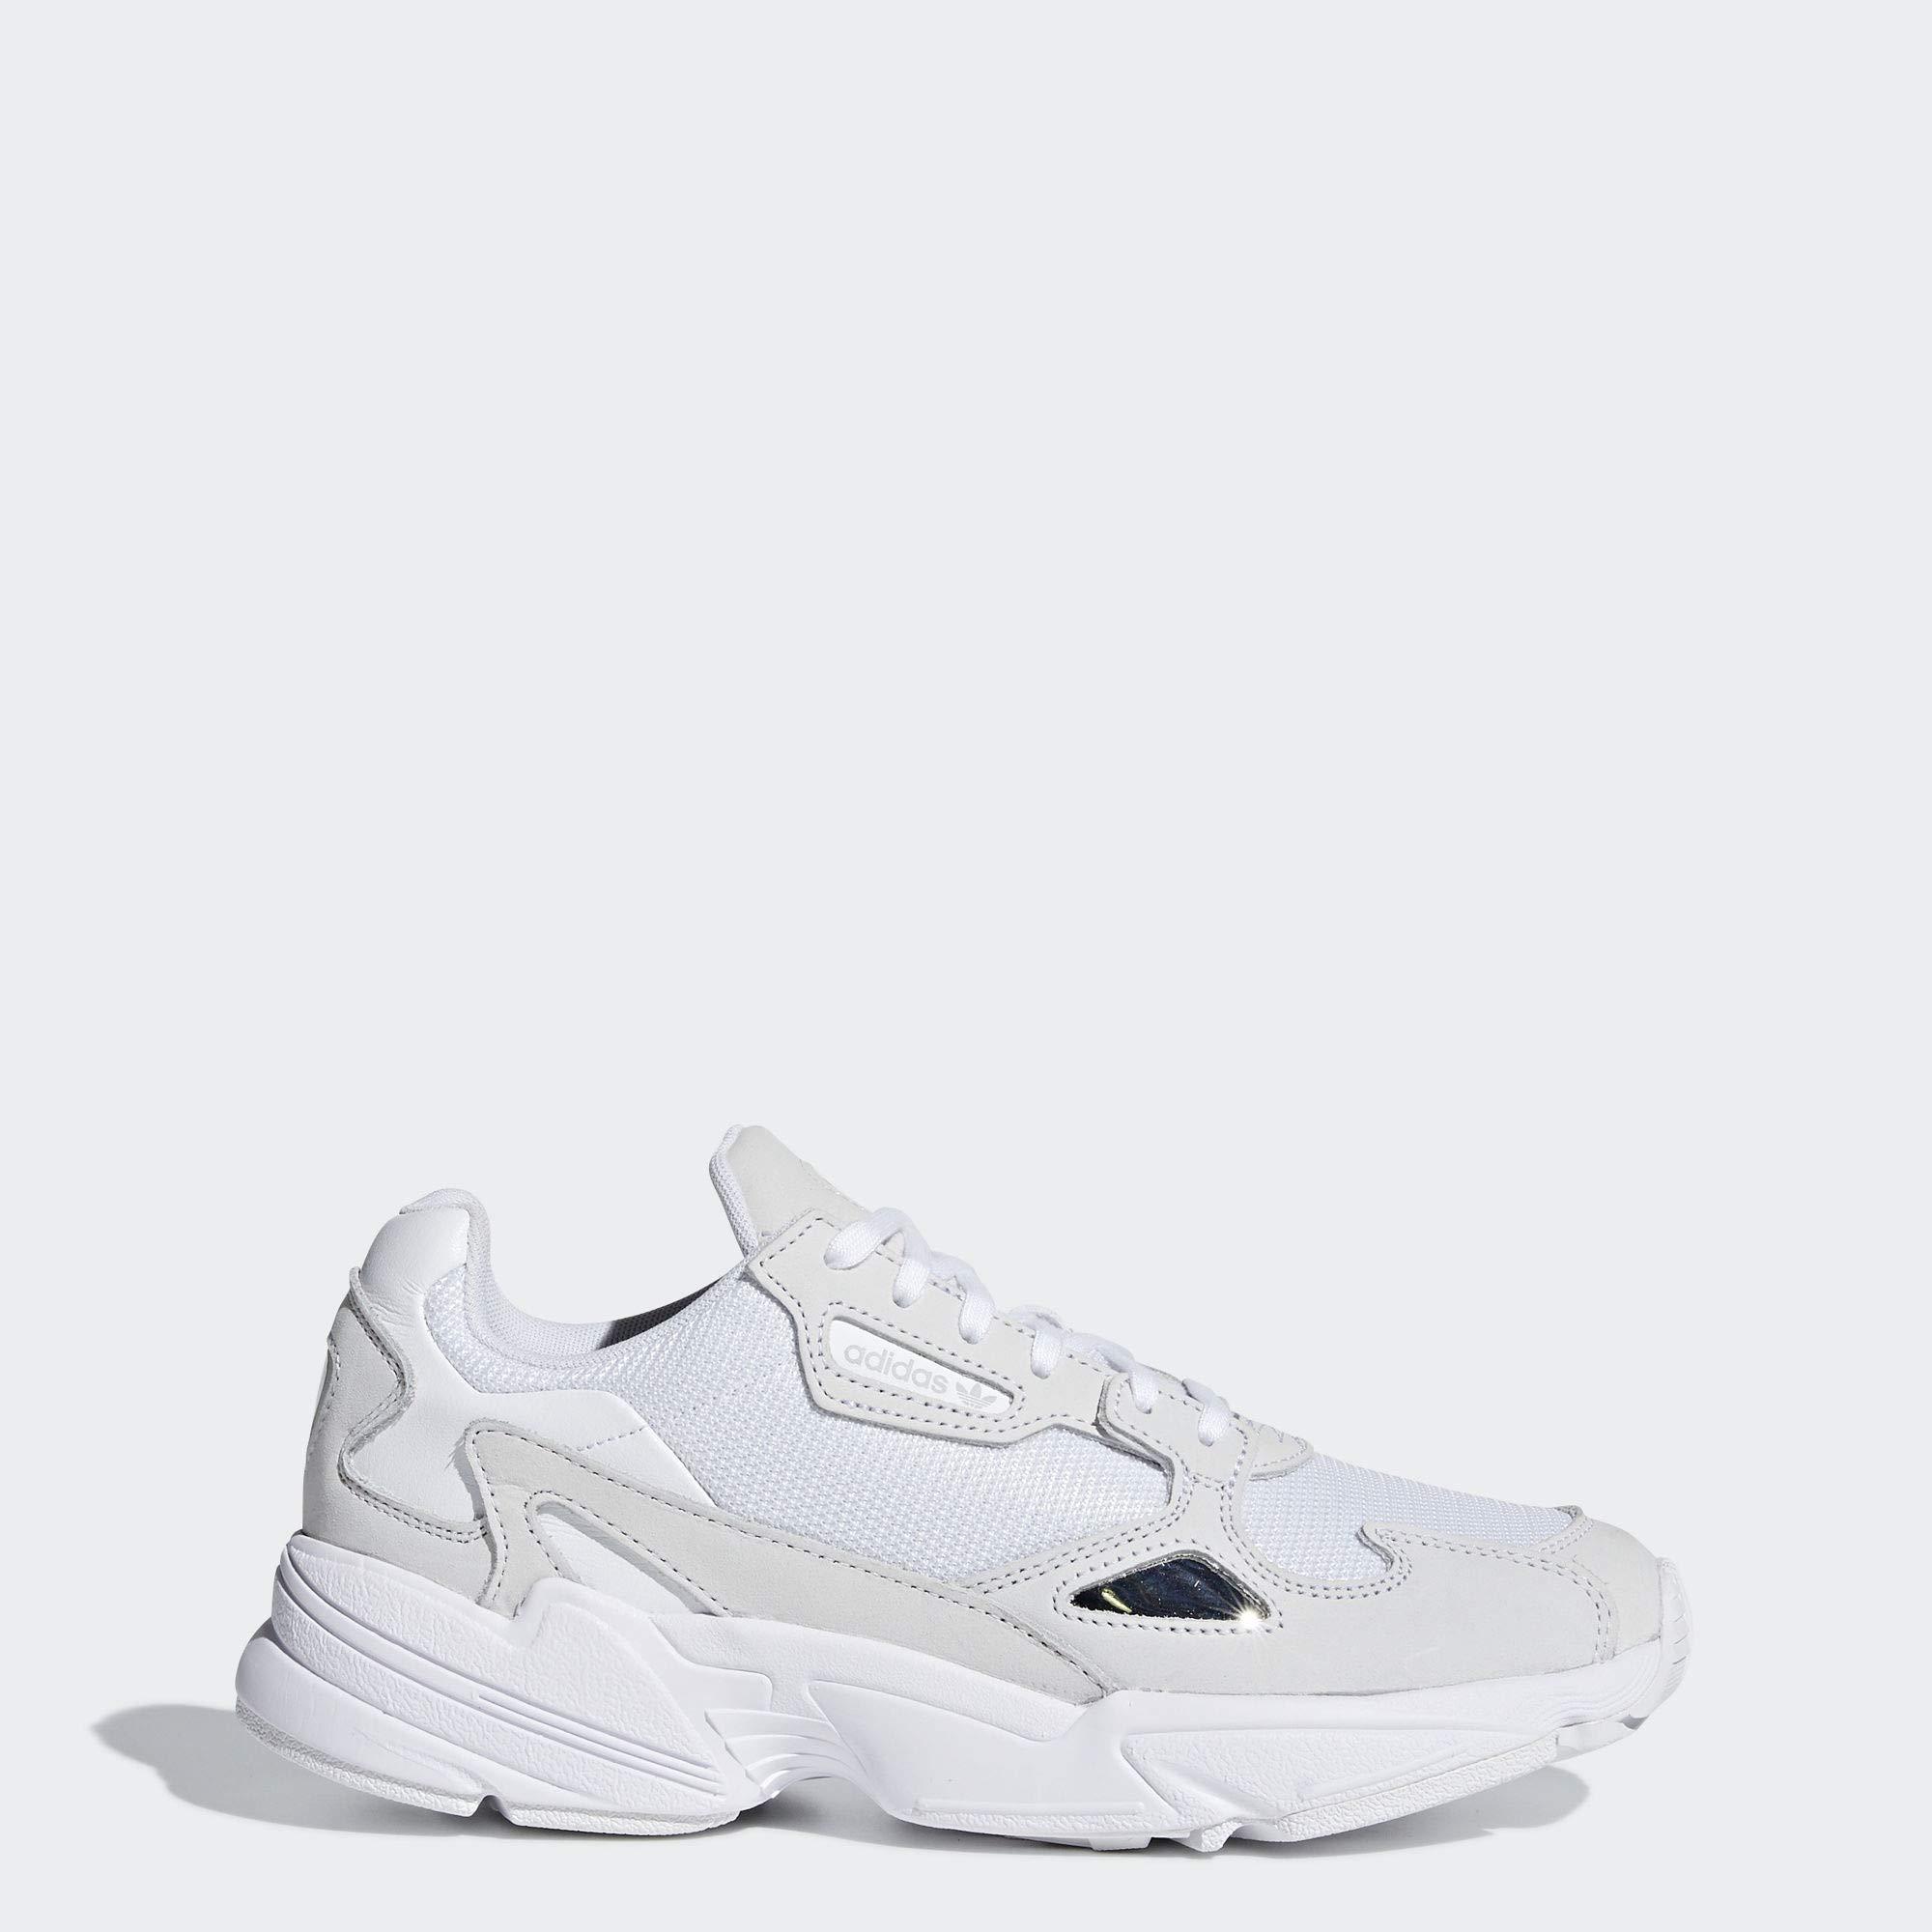 adidas Originals Women's Falcon Running Shoe, Crystal White, 7 M US by adidas Originals